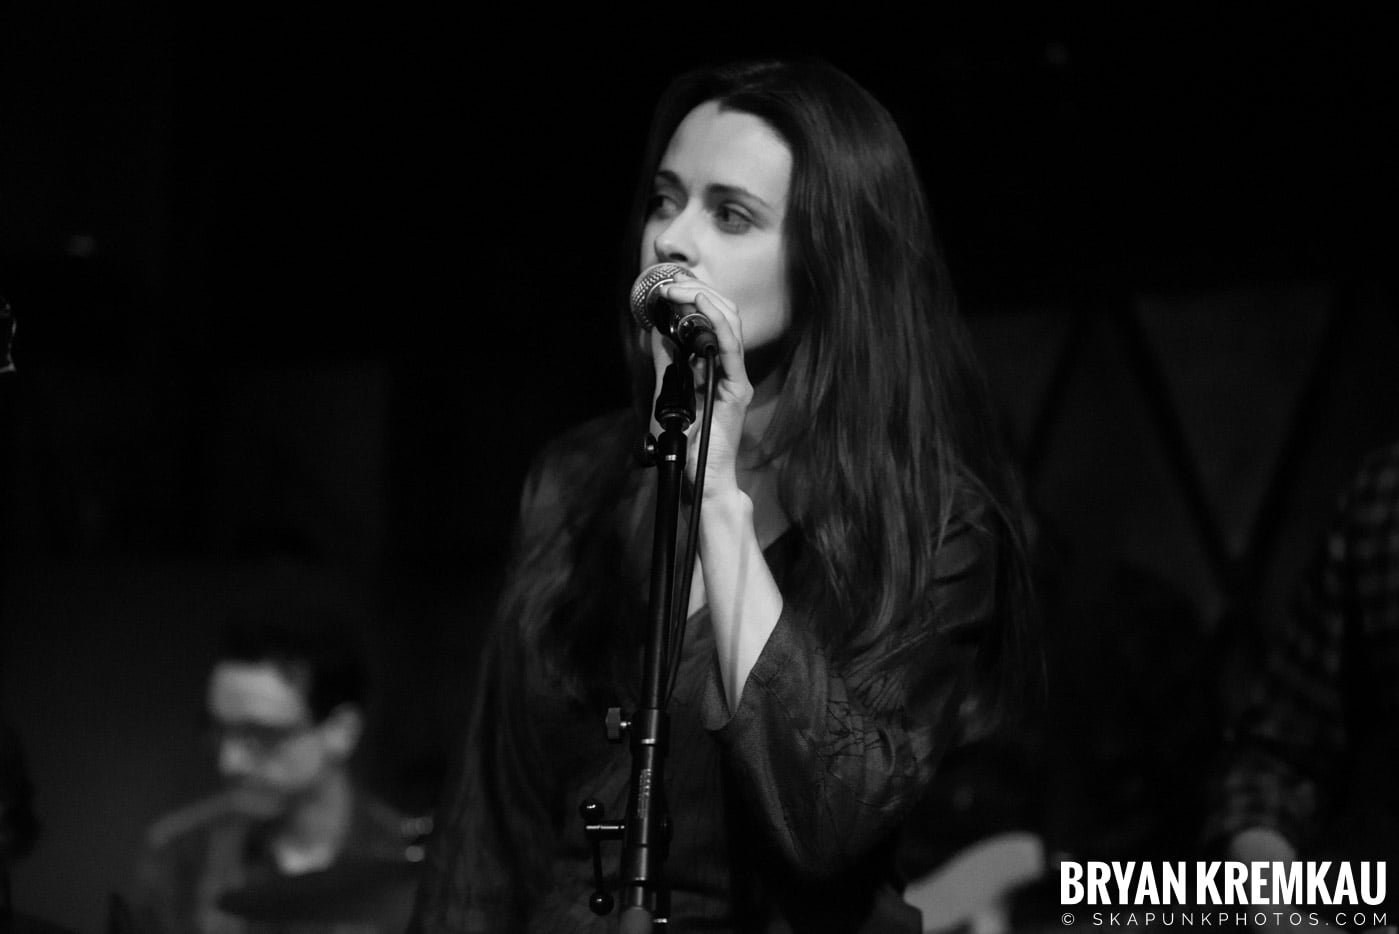 Peter Bradley Adams @ Rockwood Music Hall, NYC - 3.9.13 (14)